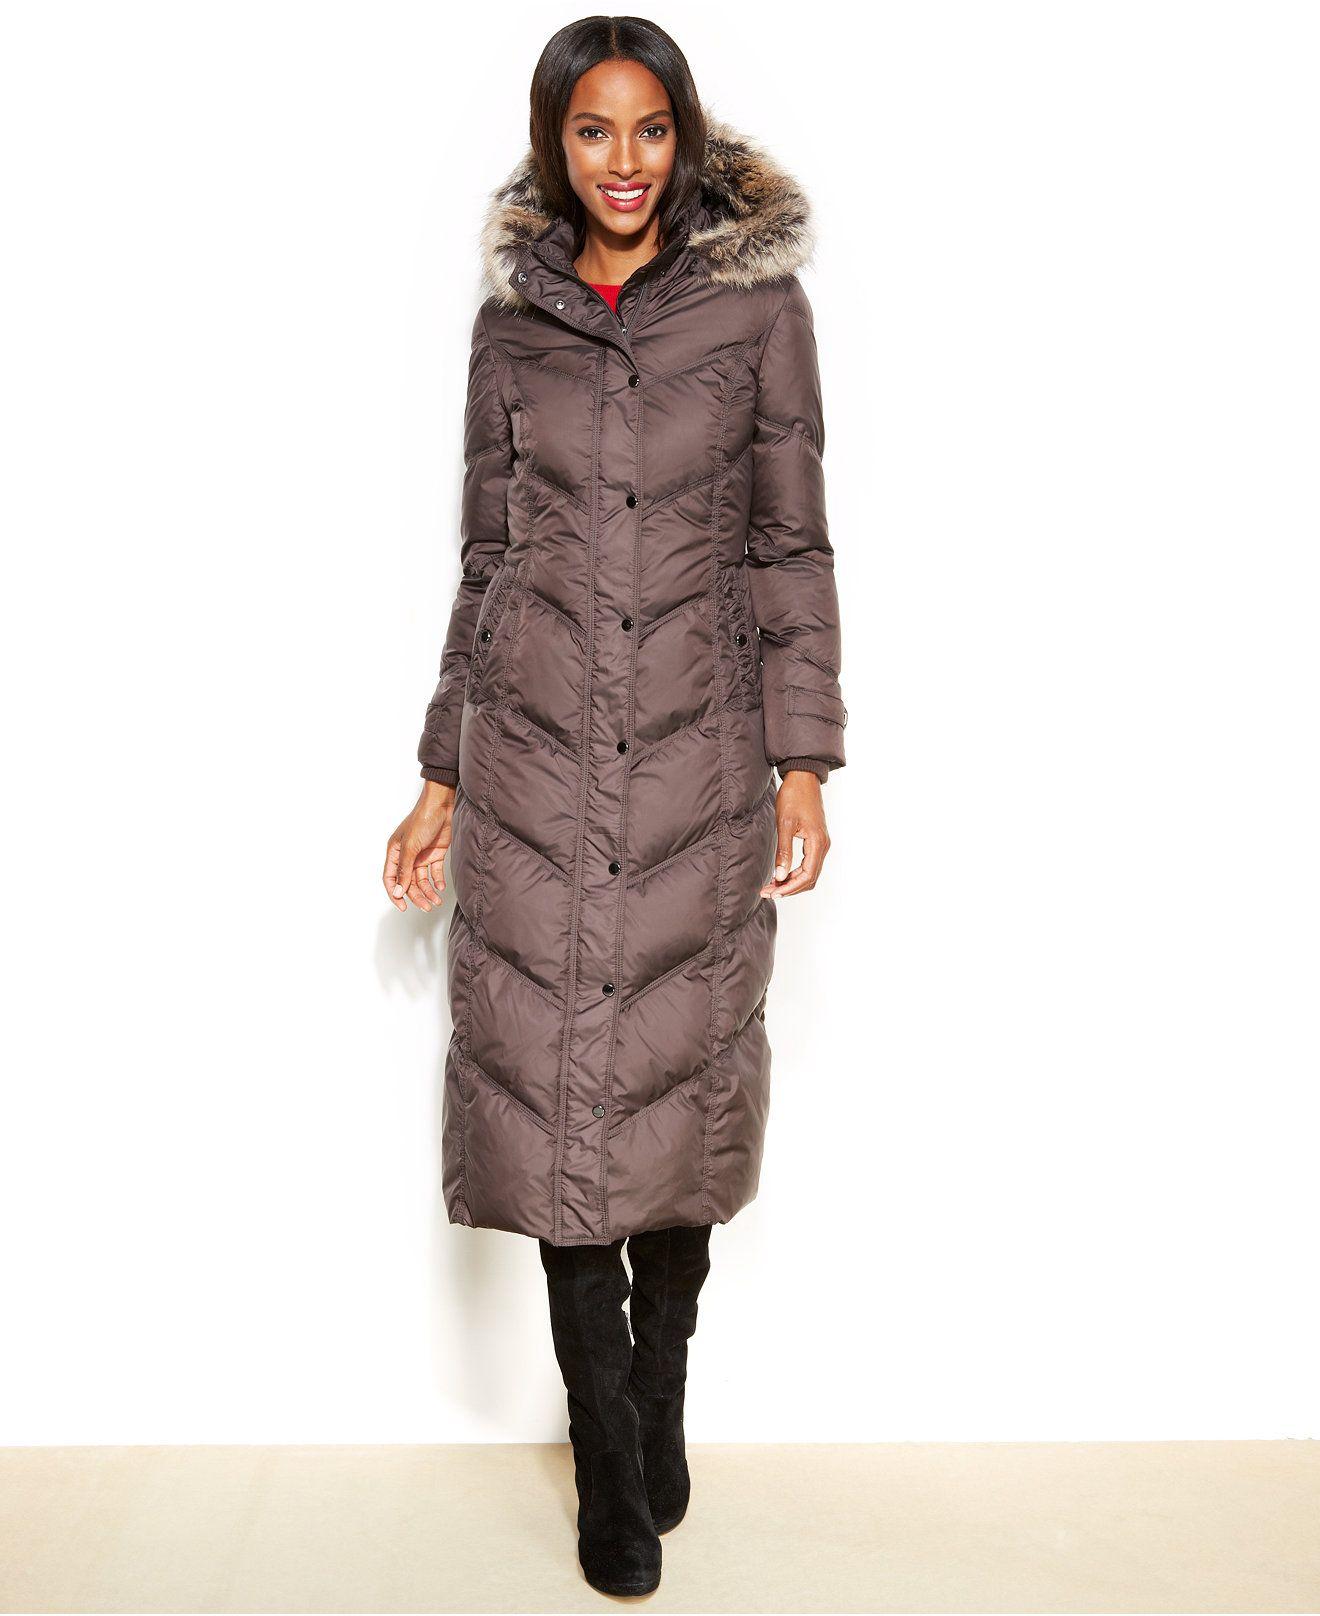 2457647e4 London Fog Hooded Faux-Fur-Trim Down Maxi Puffer Coat - Coats ...